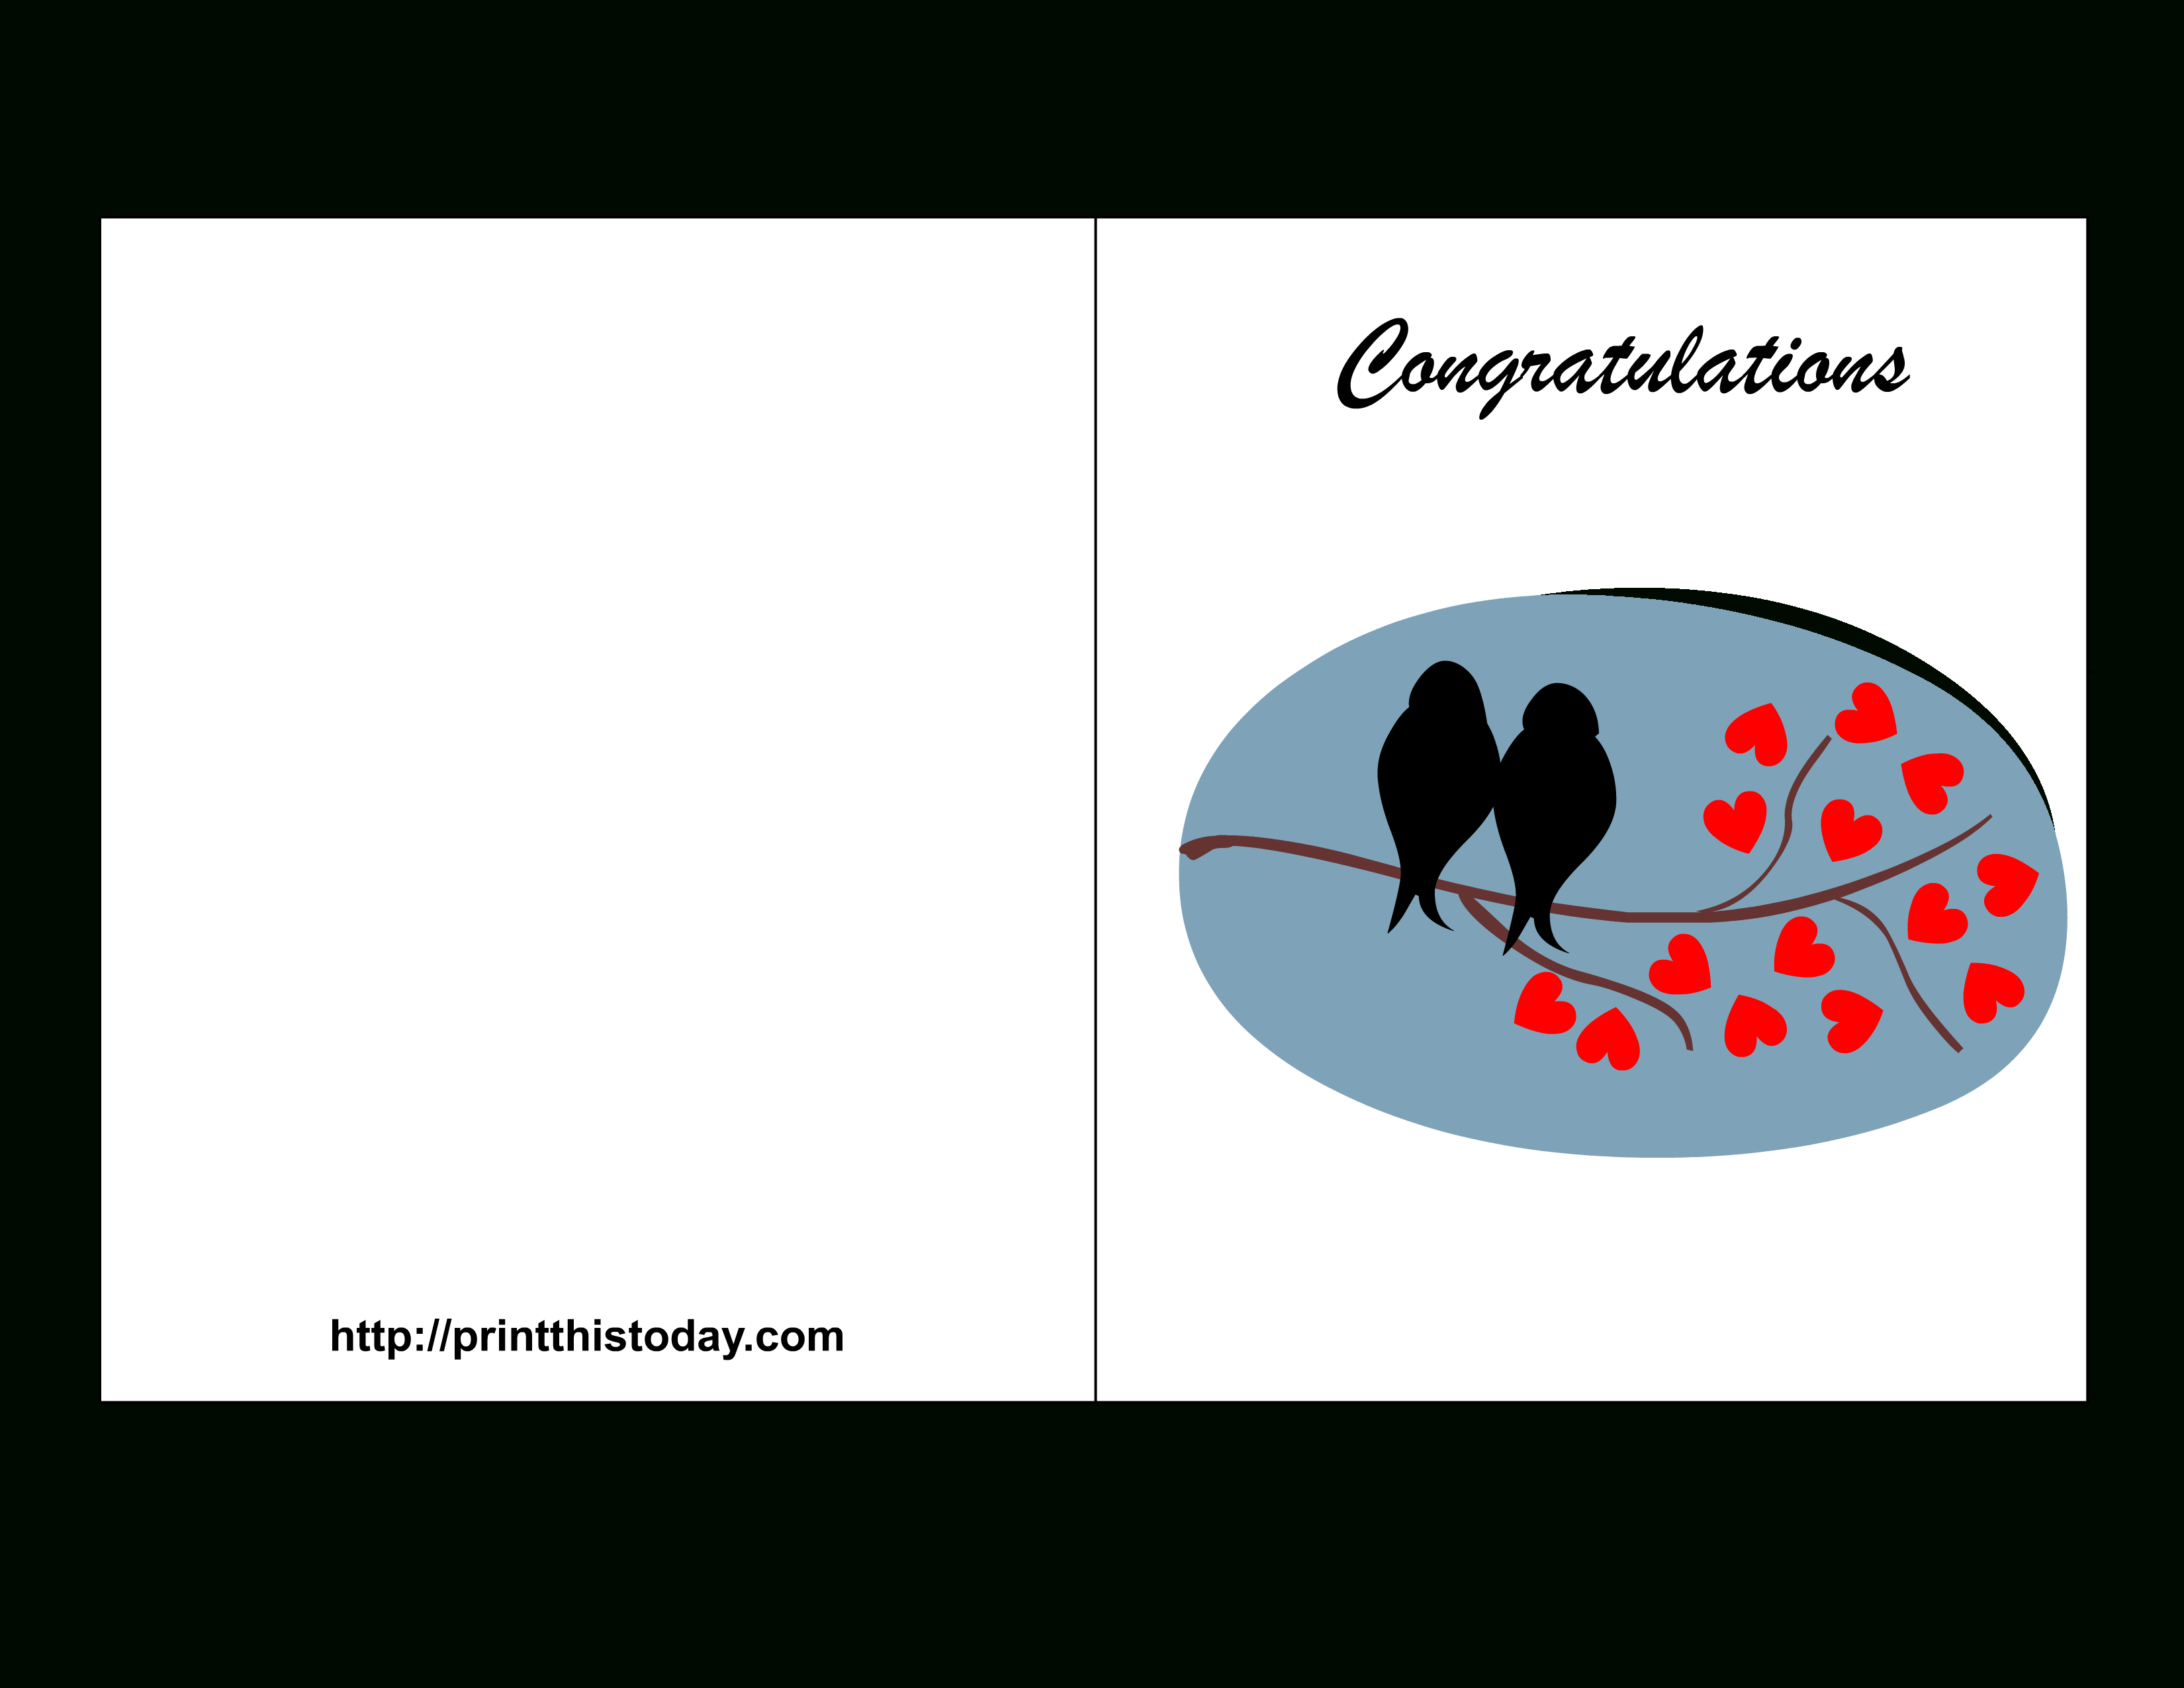 Free Printable Wedding Congratulations Cards - Free Printable Greeting Card Sentiments